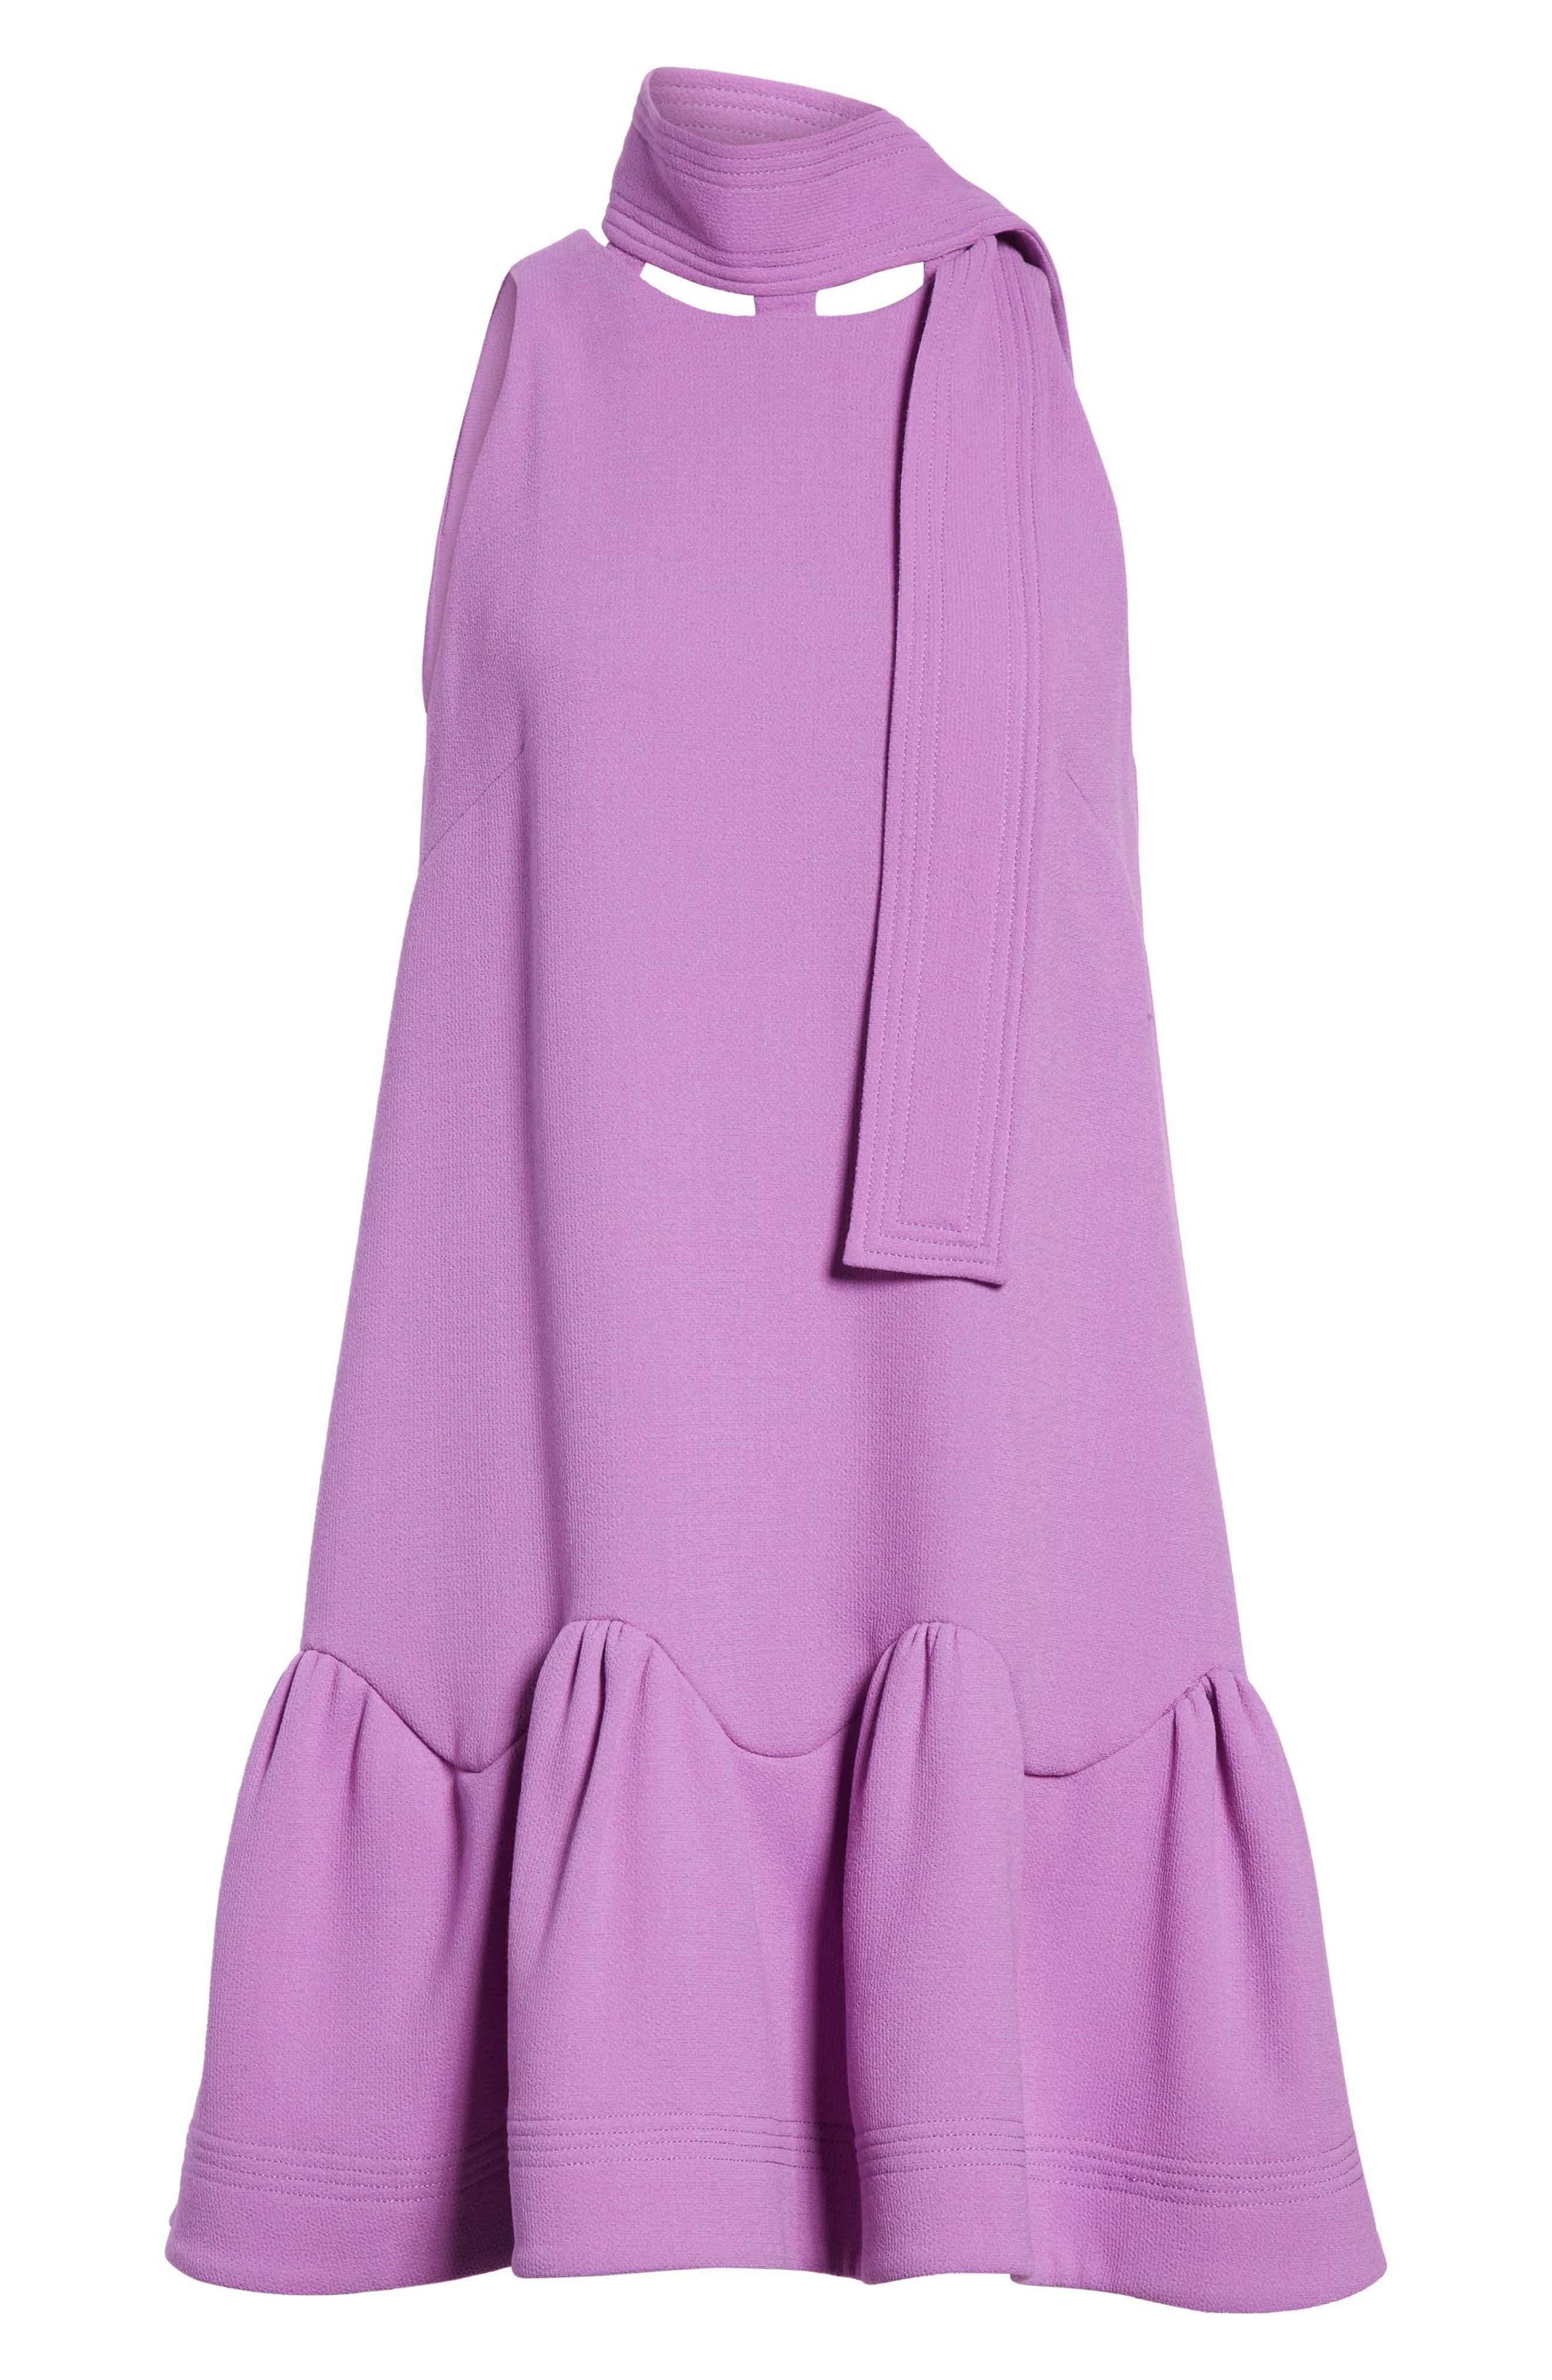 Scarf Neck Wool Blend Crepe Drop Waist Dress,                             Alternate thumbnail 9, color,                             LAVENDER